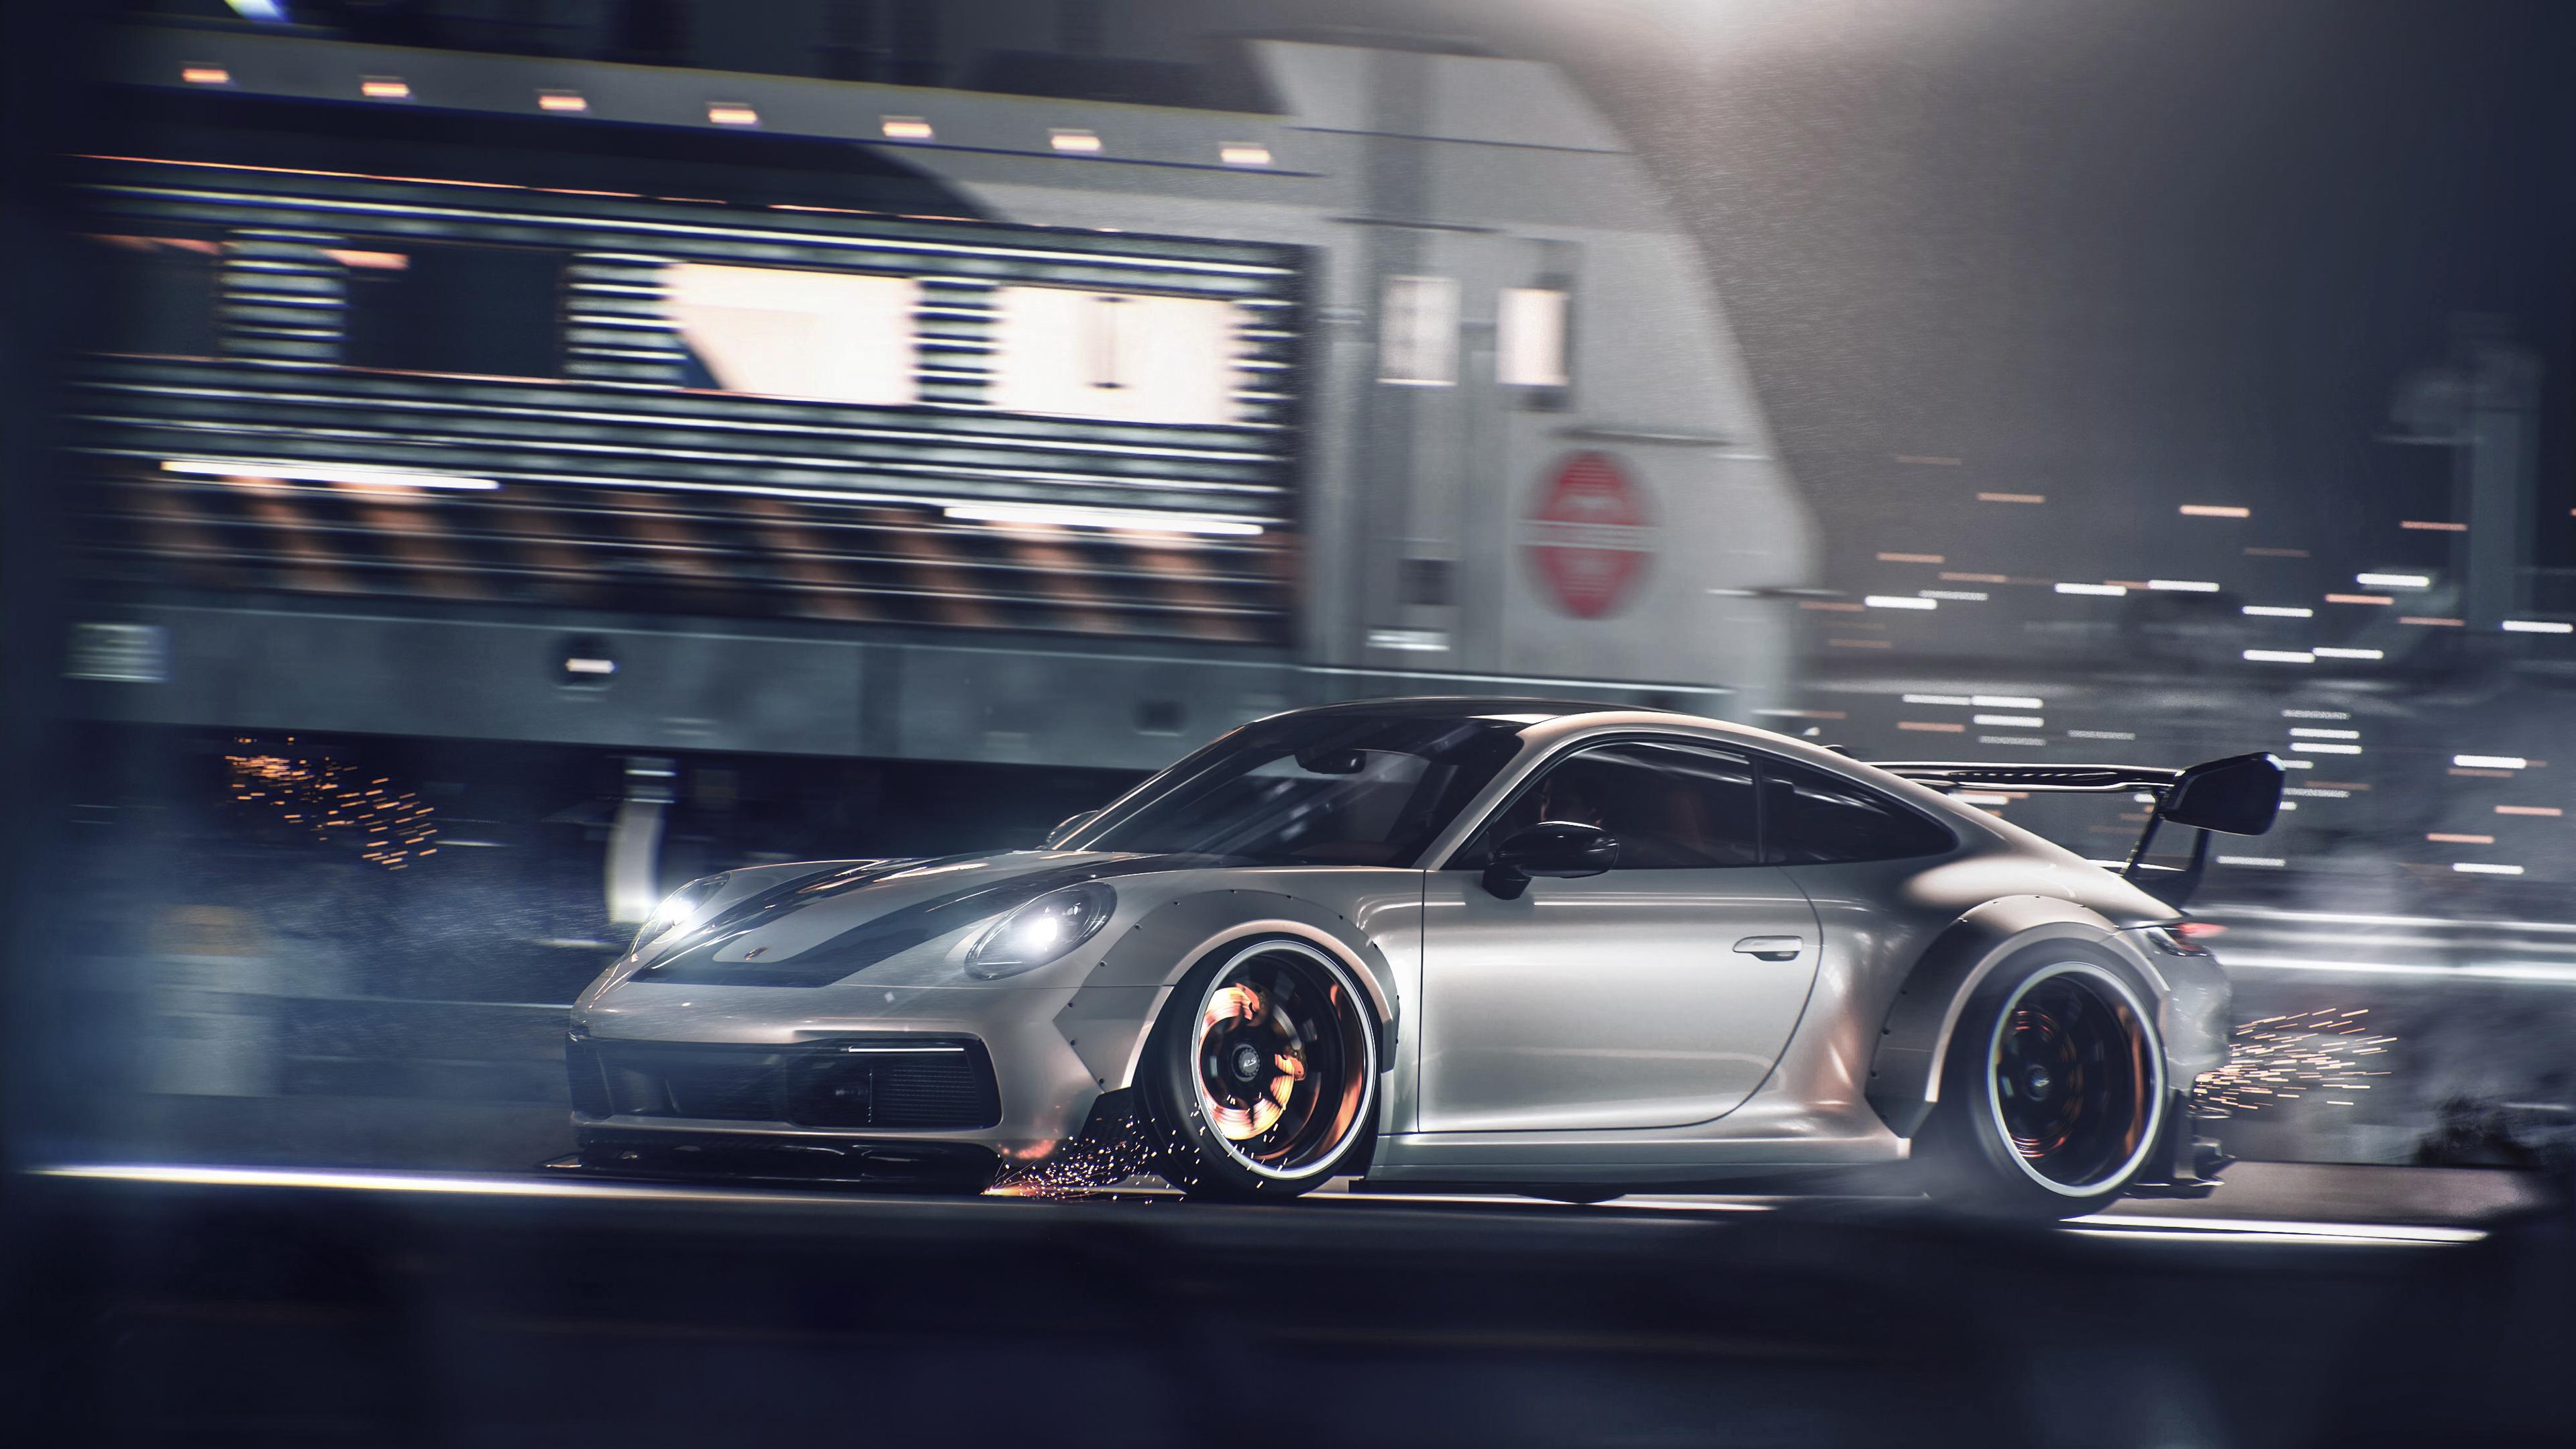 porsche gt3 911 gt 4k 1554245237 - Porsche GT3 911 GT 4k - porsche wallpapers, porsche 911 wallpapers, hd-wallpapers, cars wallpapers, behance wallpapers, 4k-wallpapers